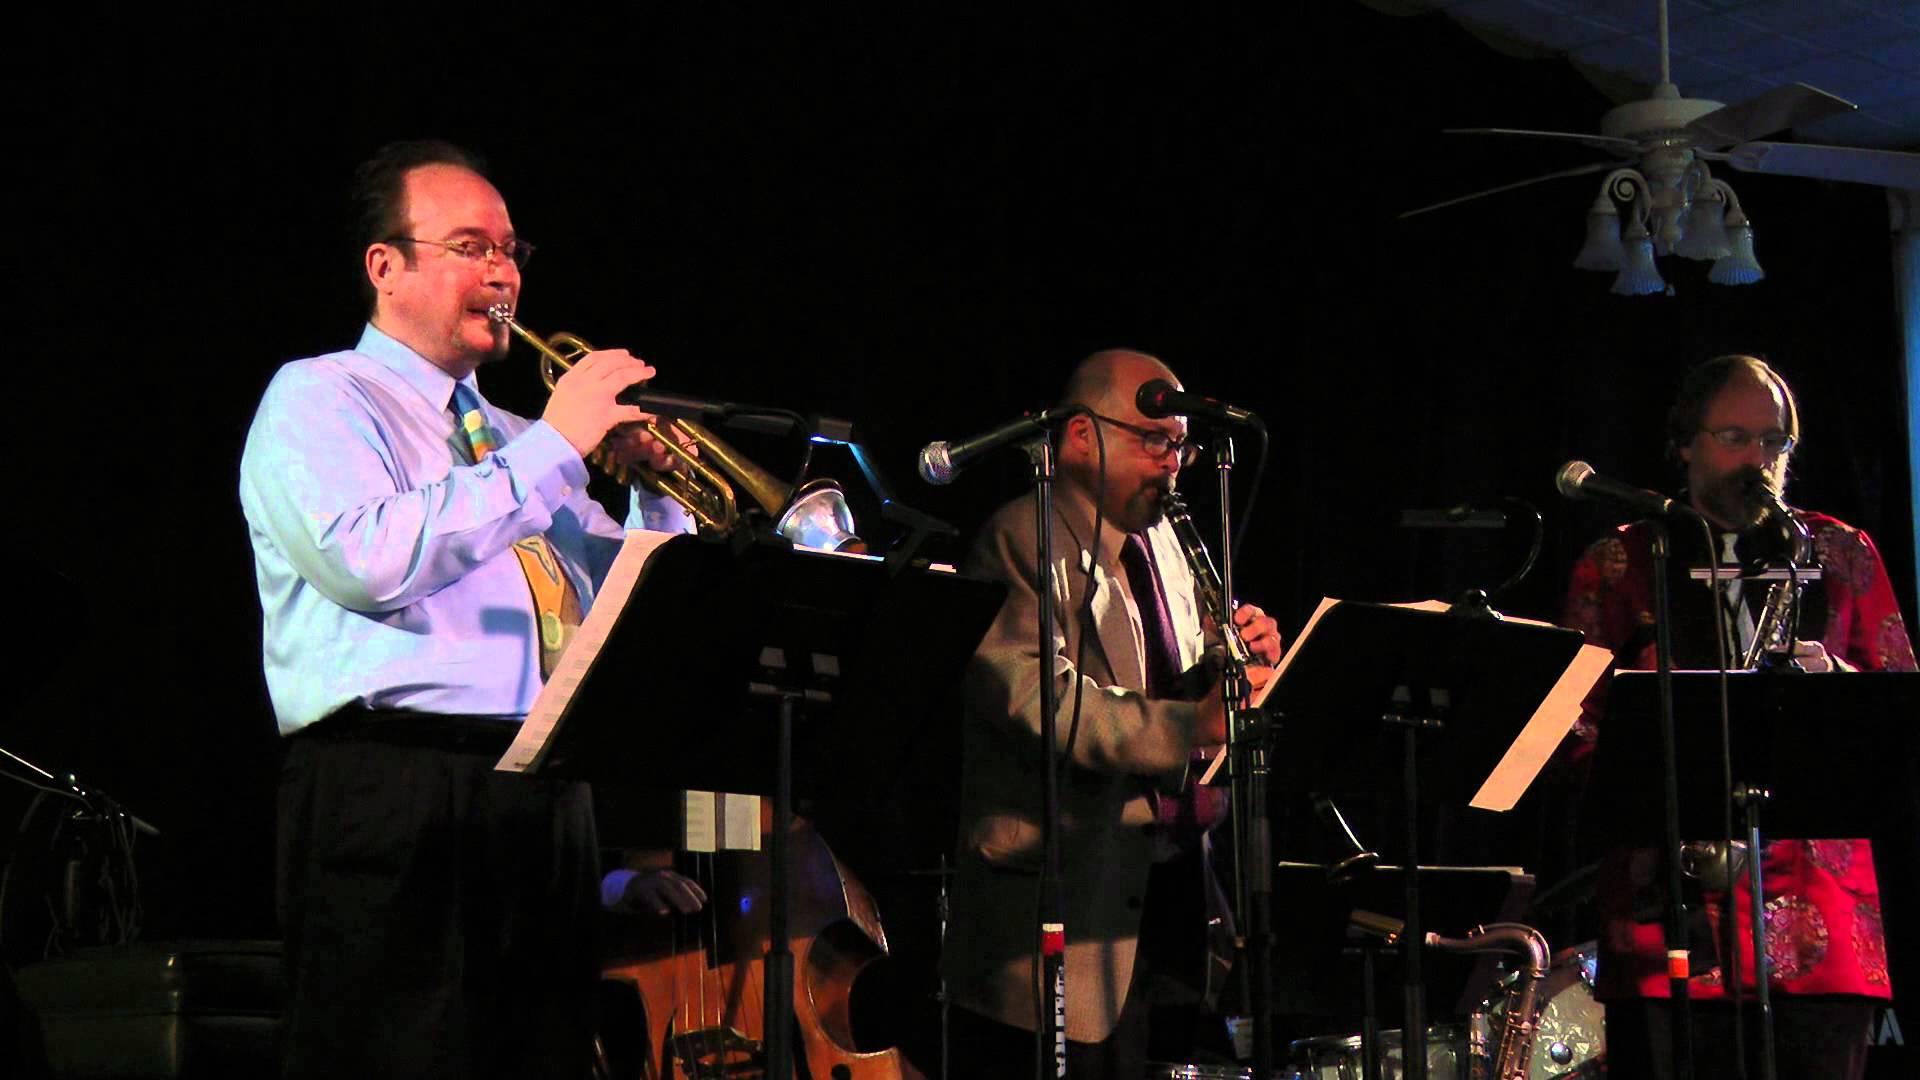 Jon-Erik Kellso, Dan Block, Scott Robinson at Jazz at Chautauqua 2011